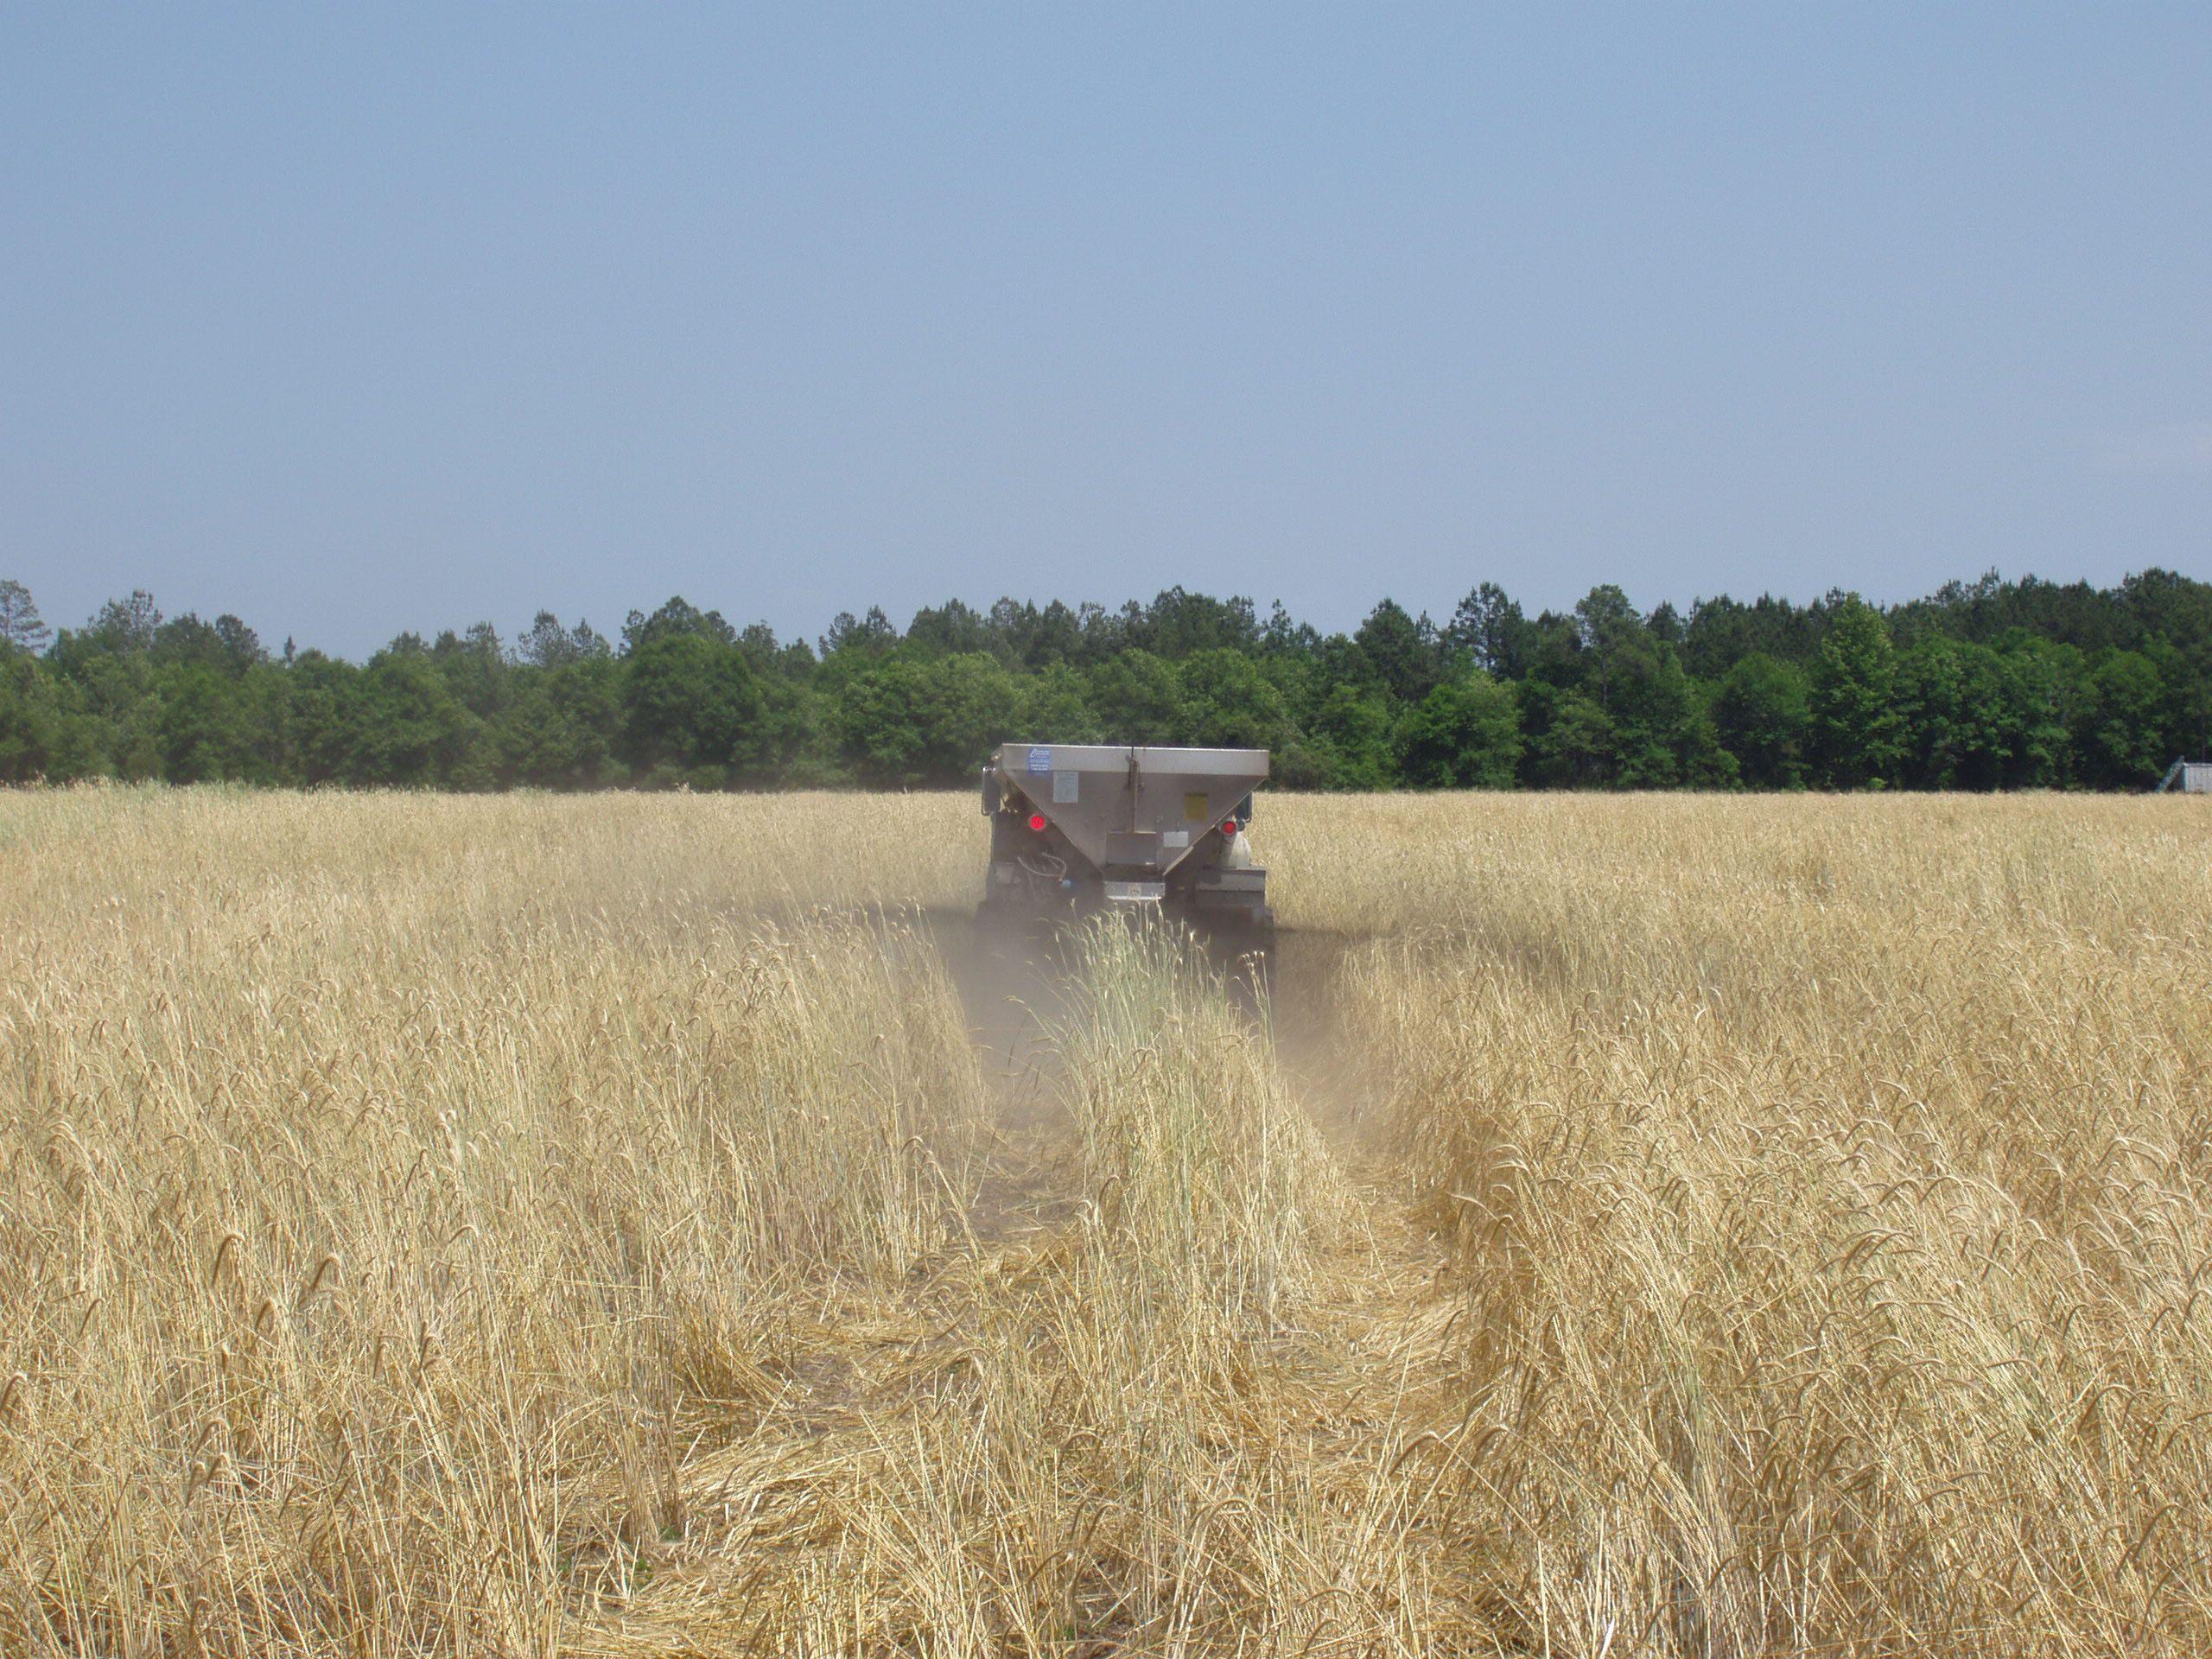 Biosolids application on cropland